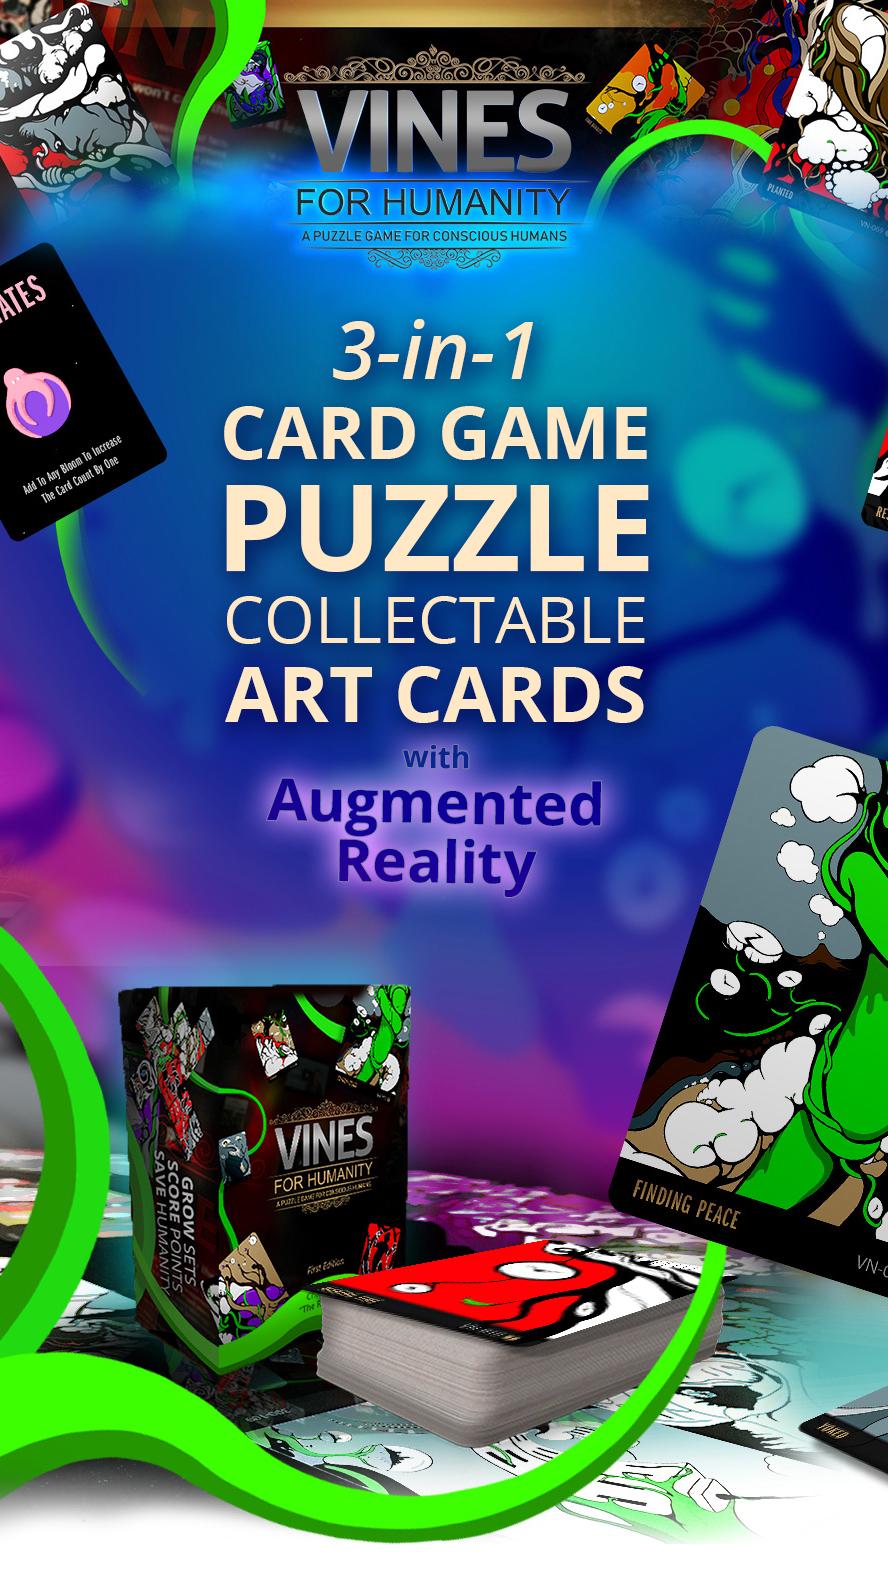 VINE-Cards-site-top-01-02